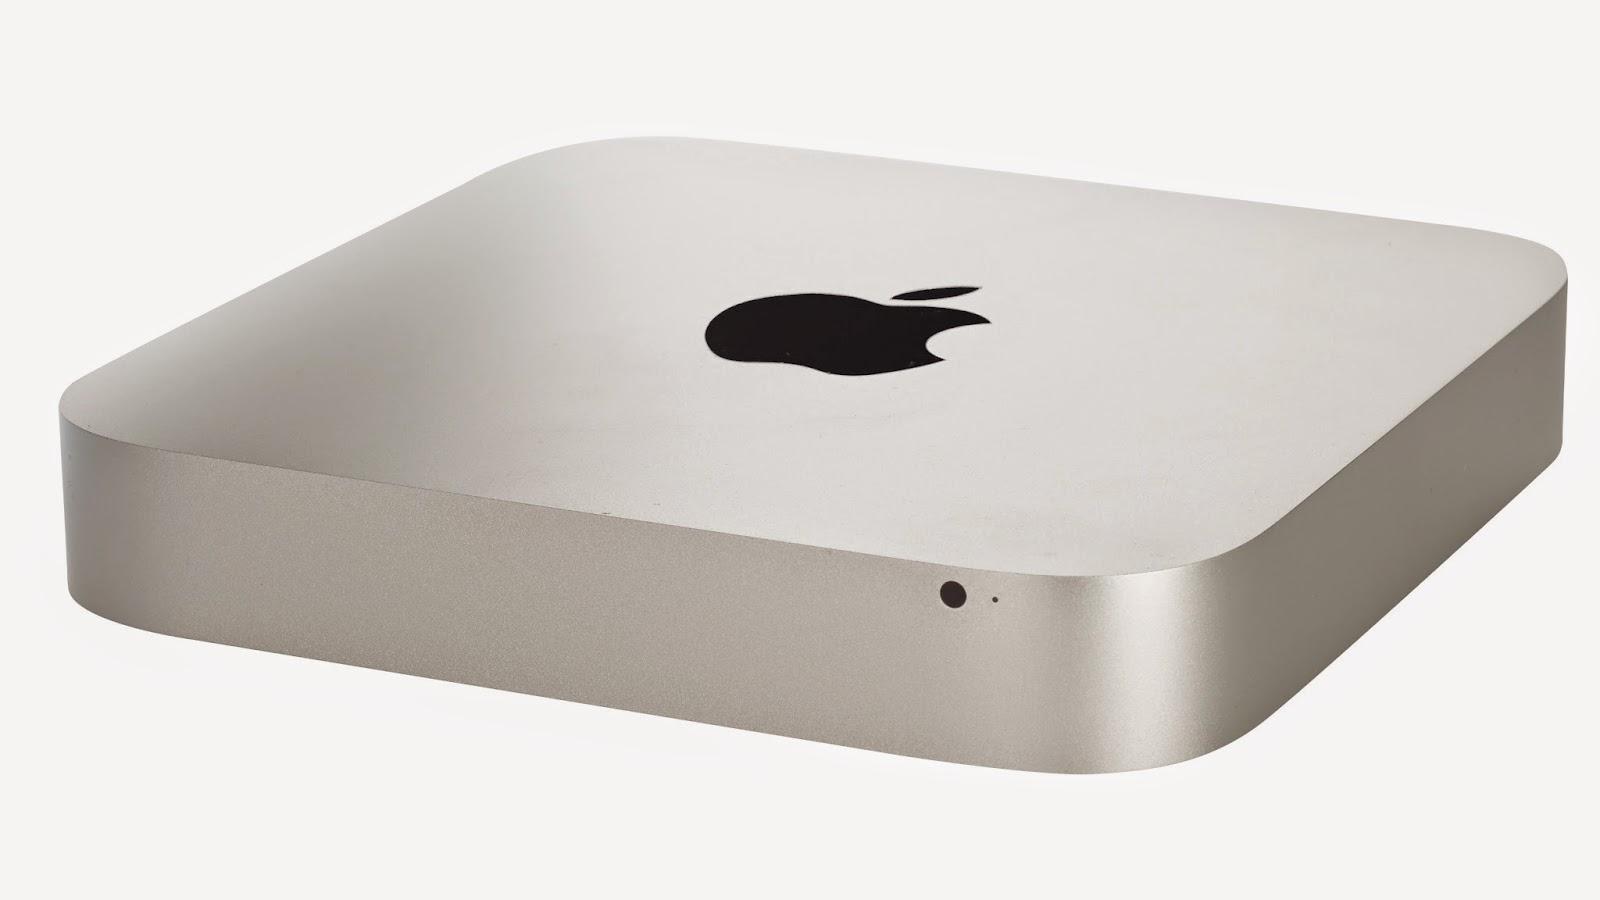 Apple Mac Mini (2014) Full review